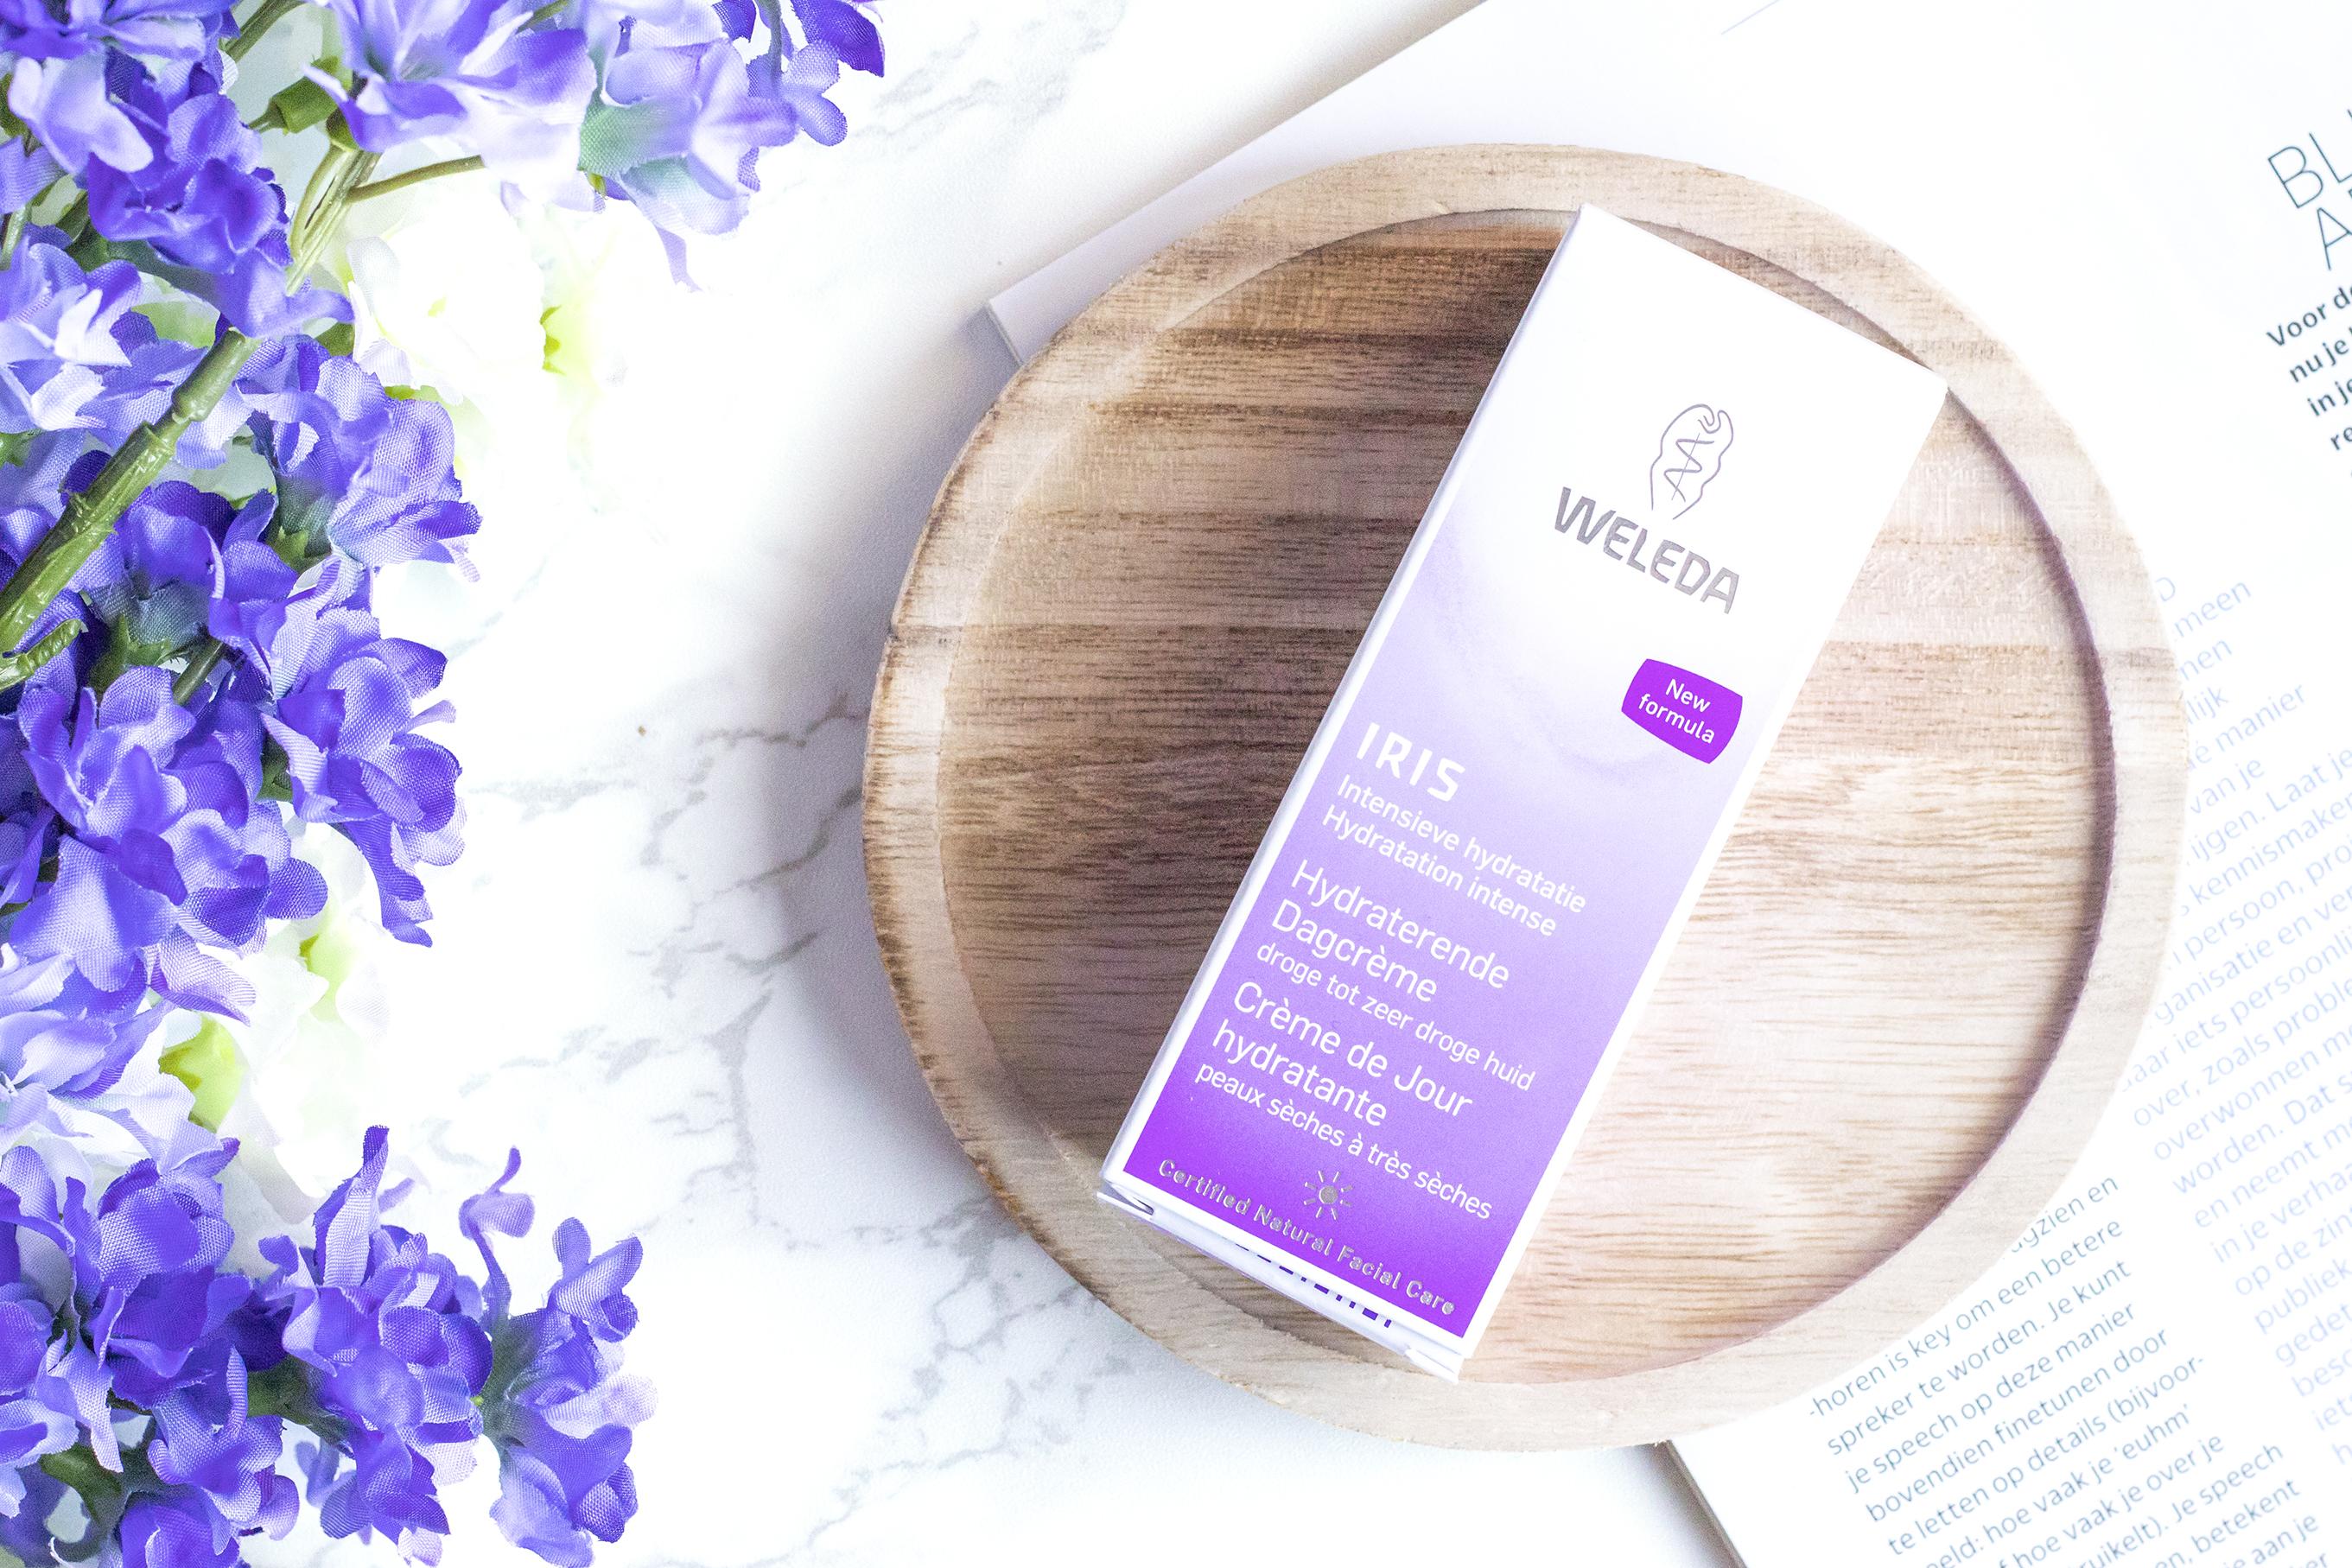 weleda iris hydraterende dagcrème